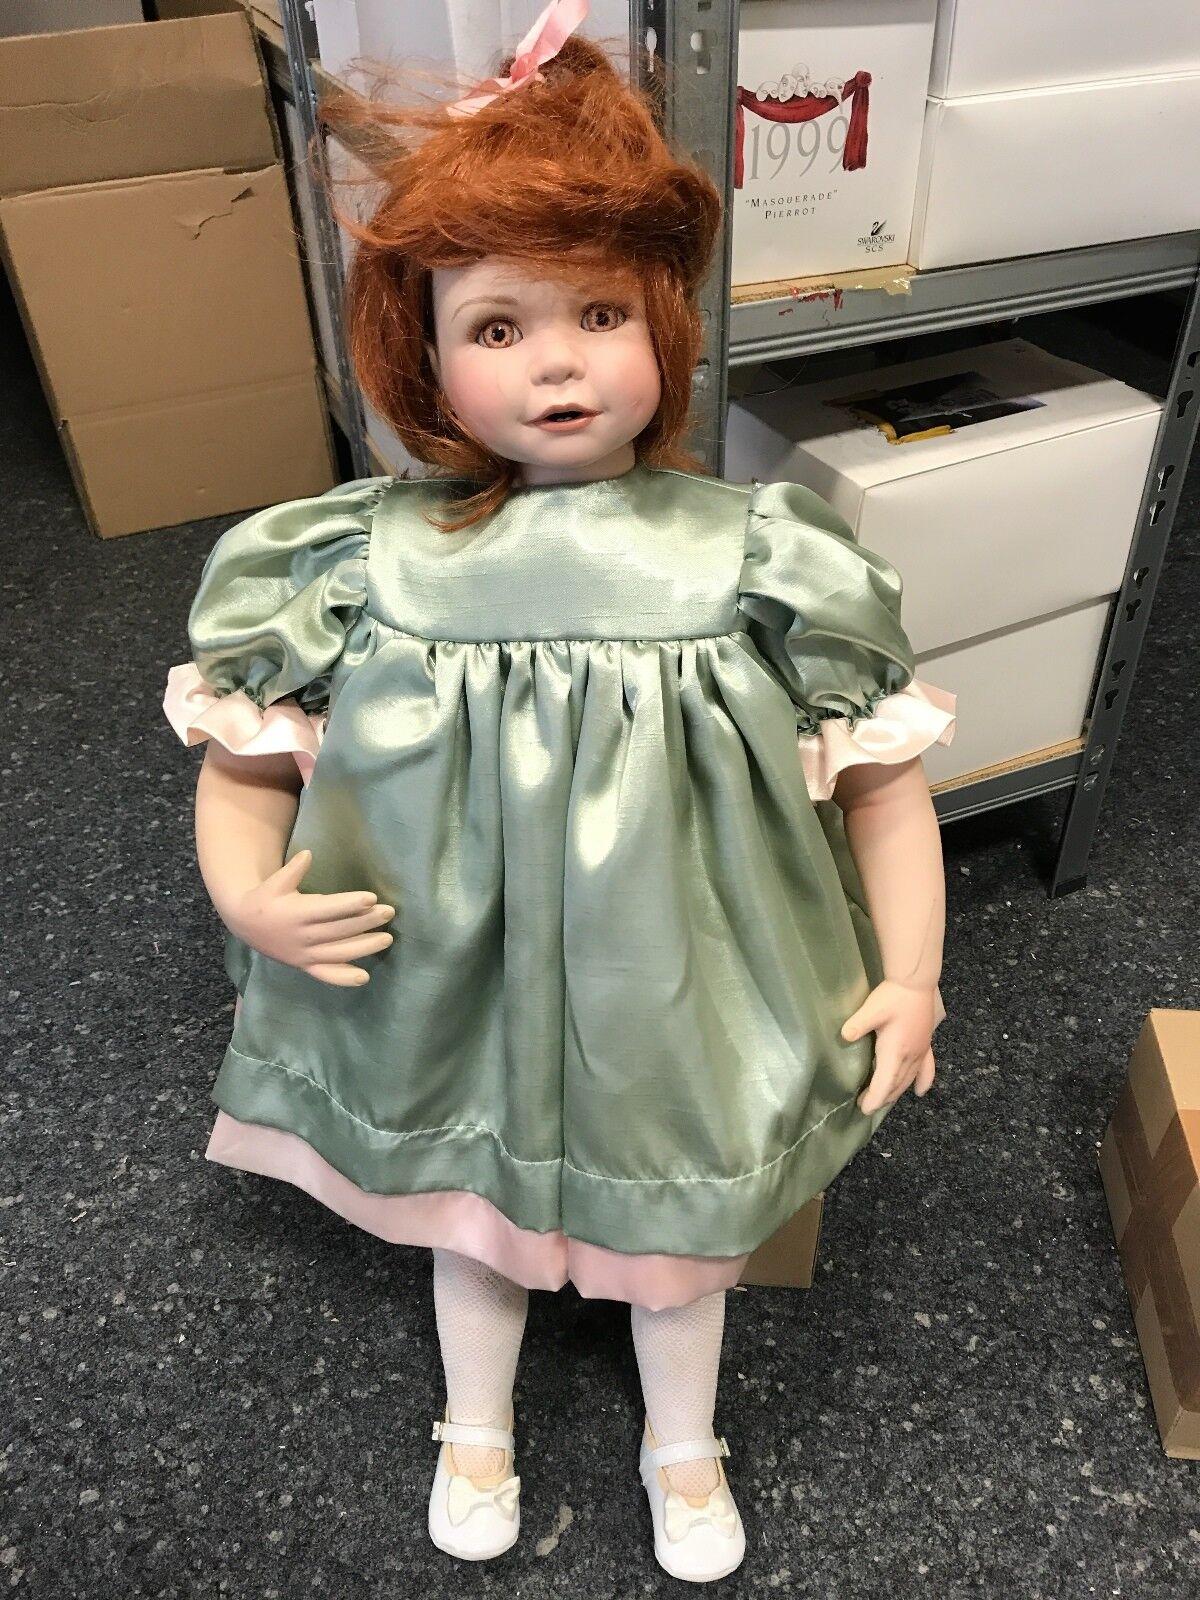 Artistas muñeca muñeca de porcelana 71 cm. top estado.